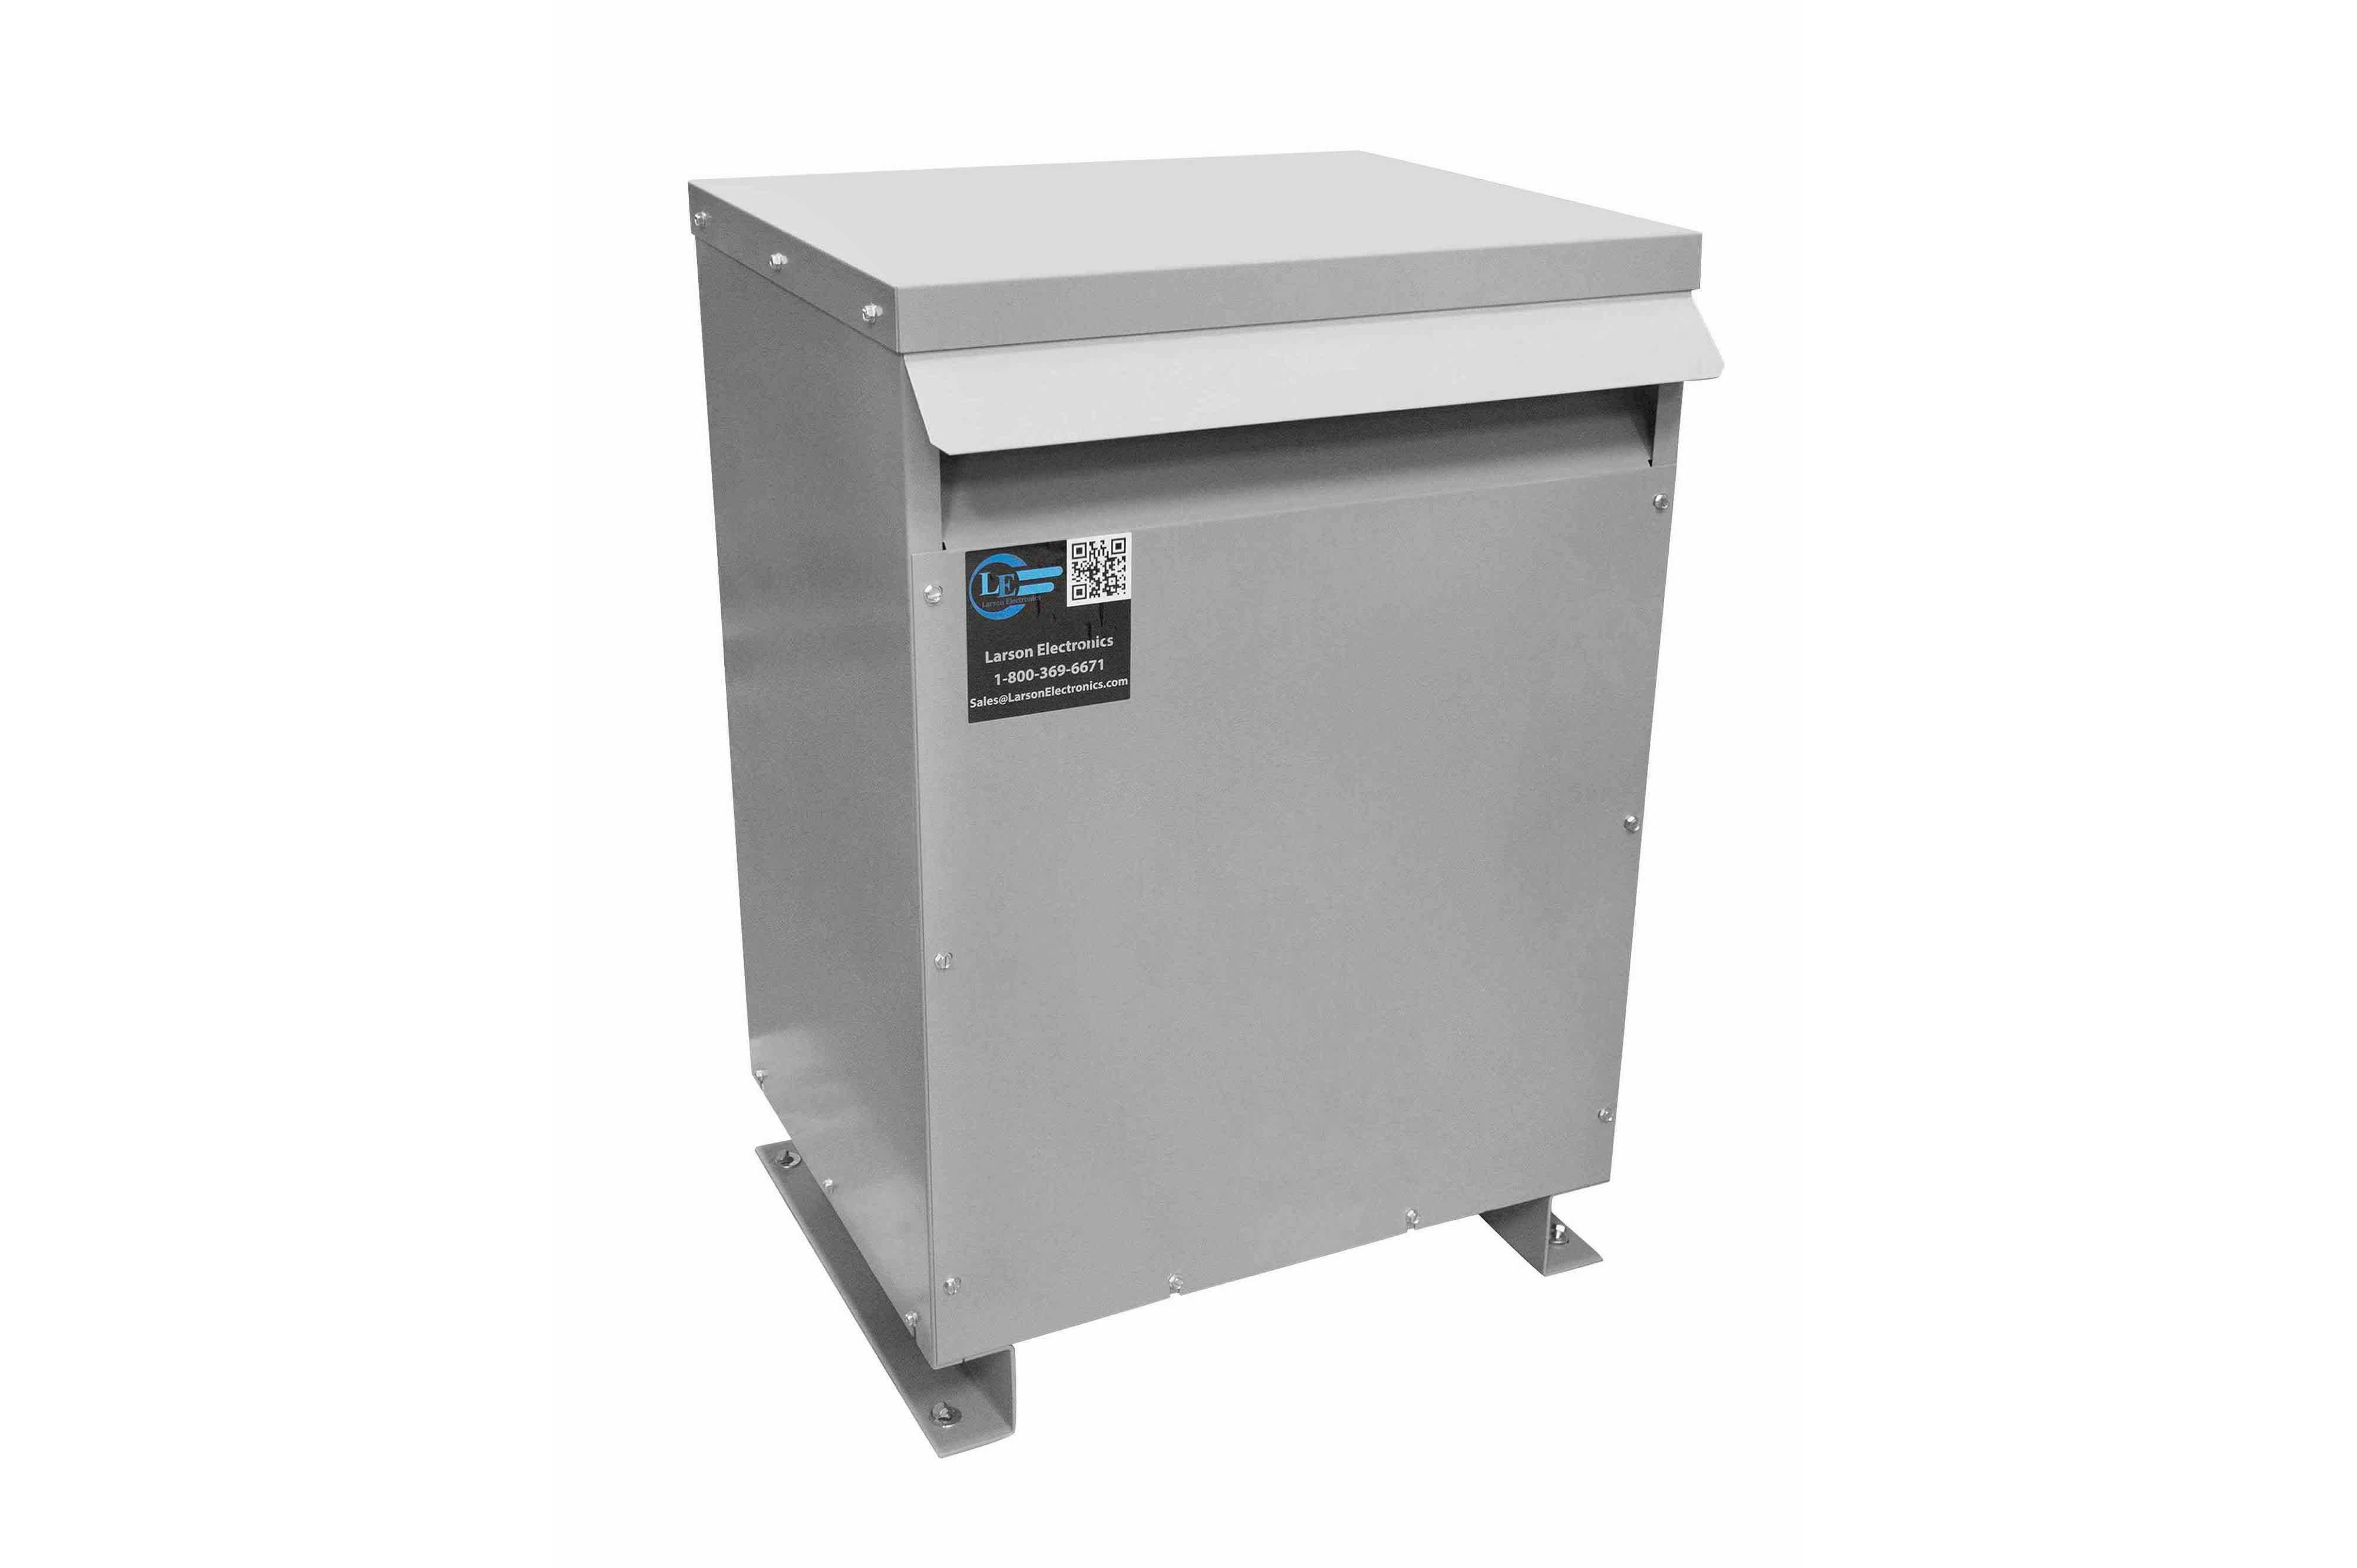 300 kVA 3PH DOE Transformer, 220V Delta Primary, 208Y/120 Wye-N Secondary, N3R, Ventilated, 60 Hz